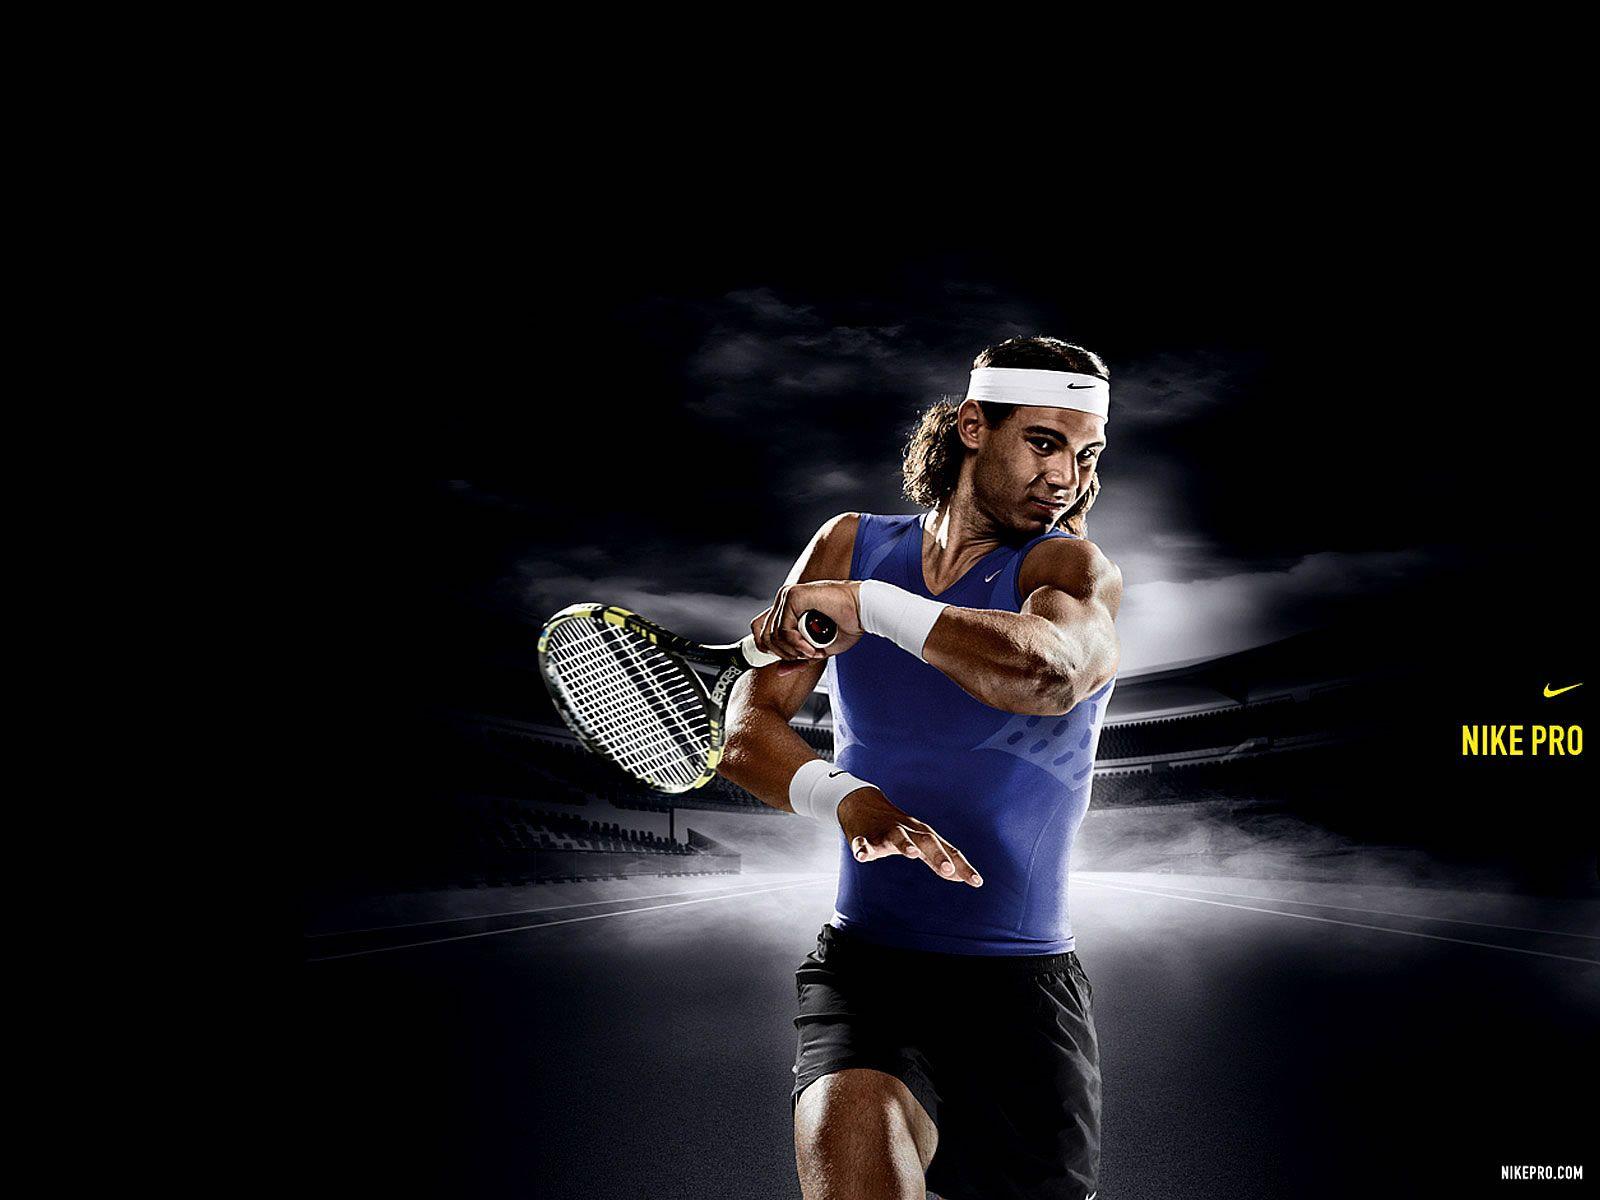 Pin By Sonny Nguyen On Sports I Love Rafael Nadal Tennis Wallpaper Tennis Stars